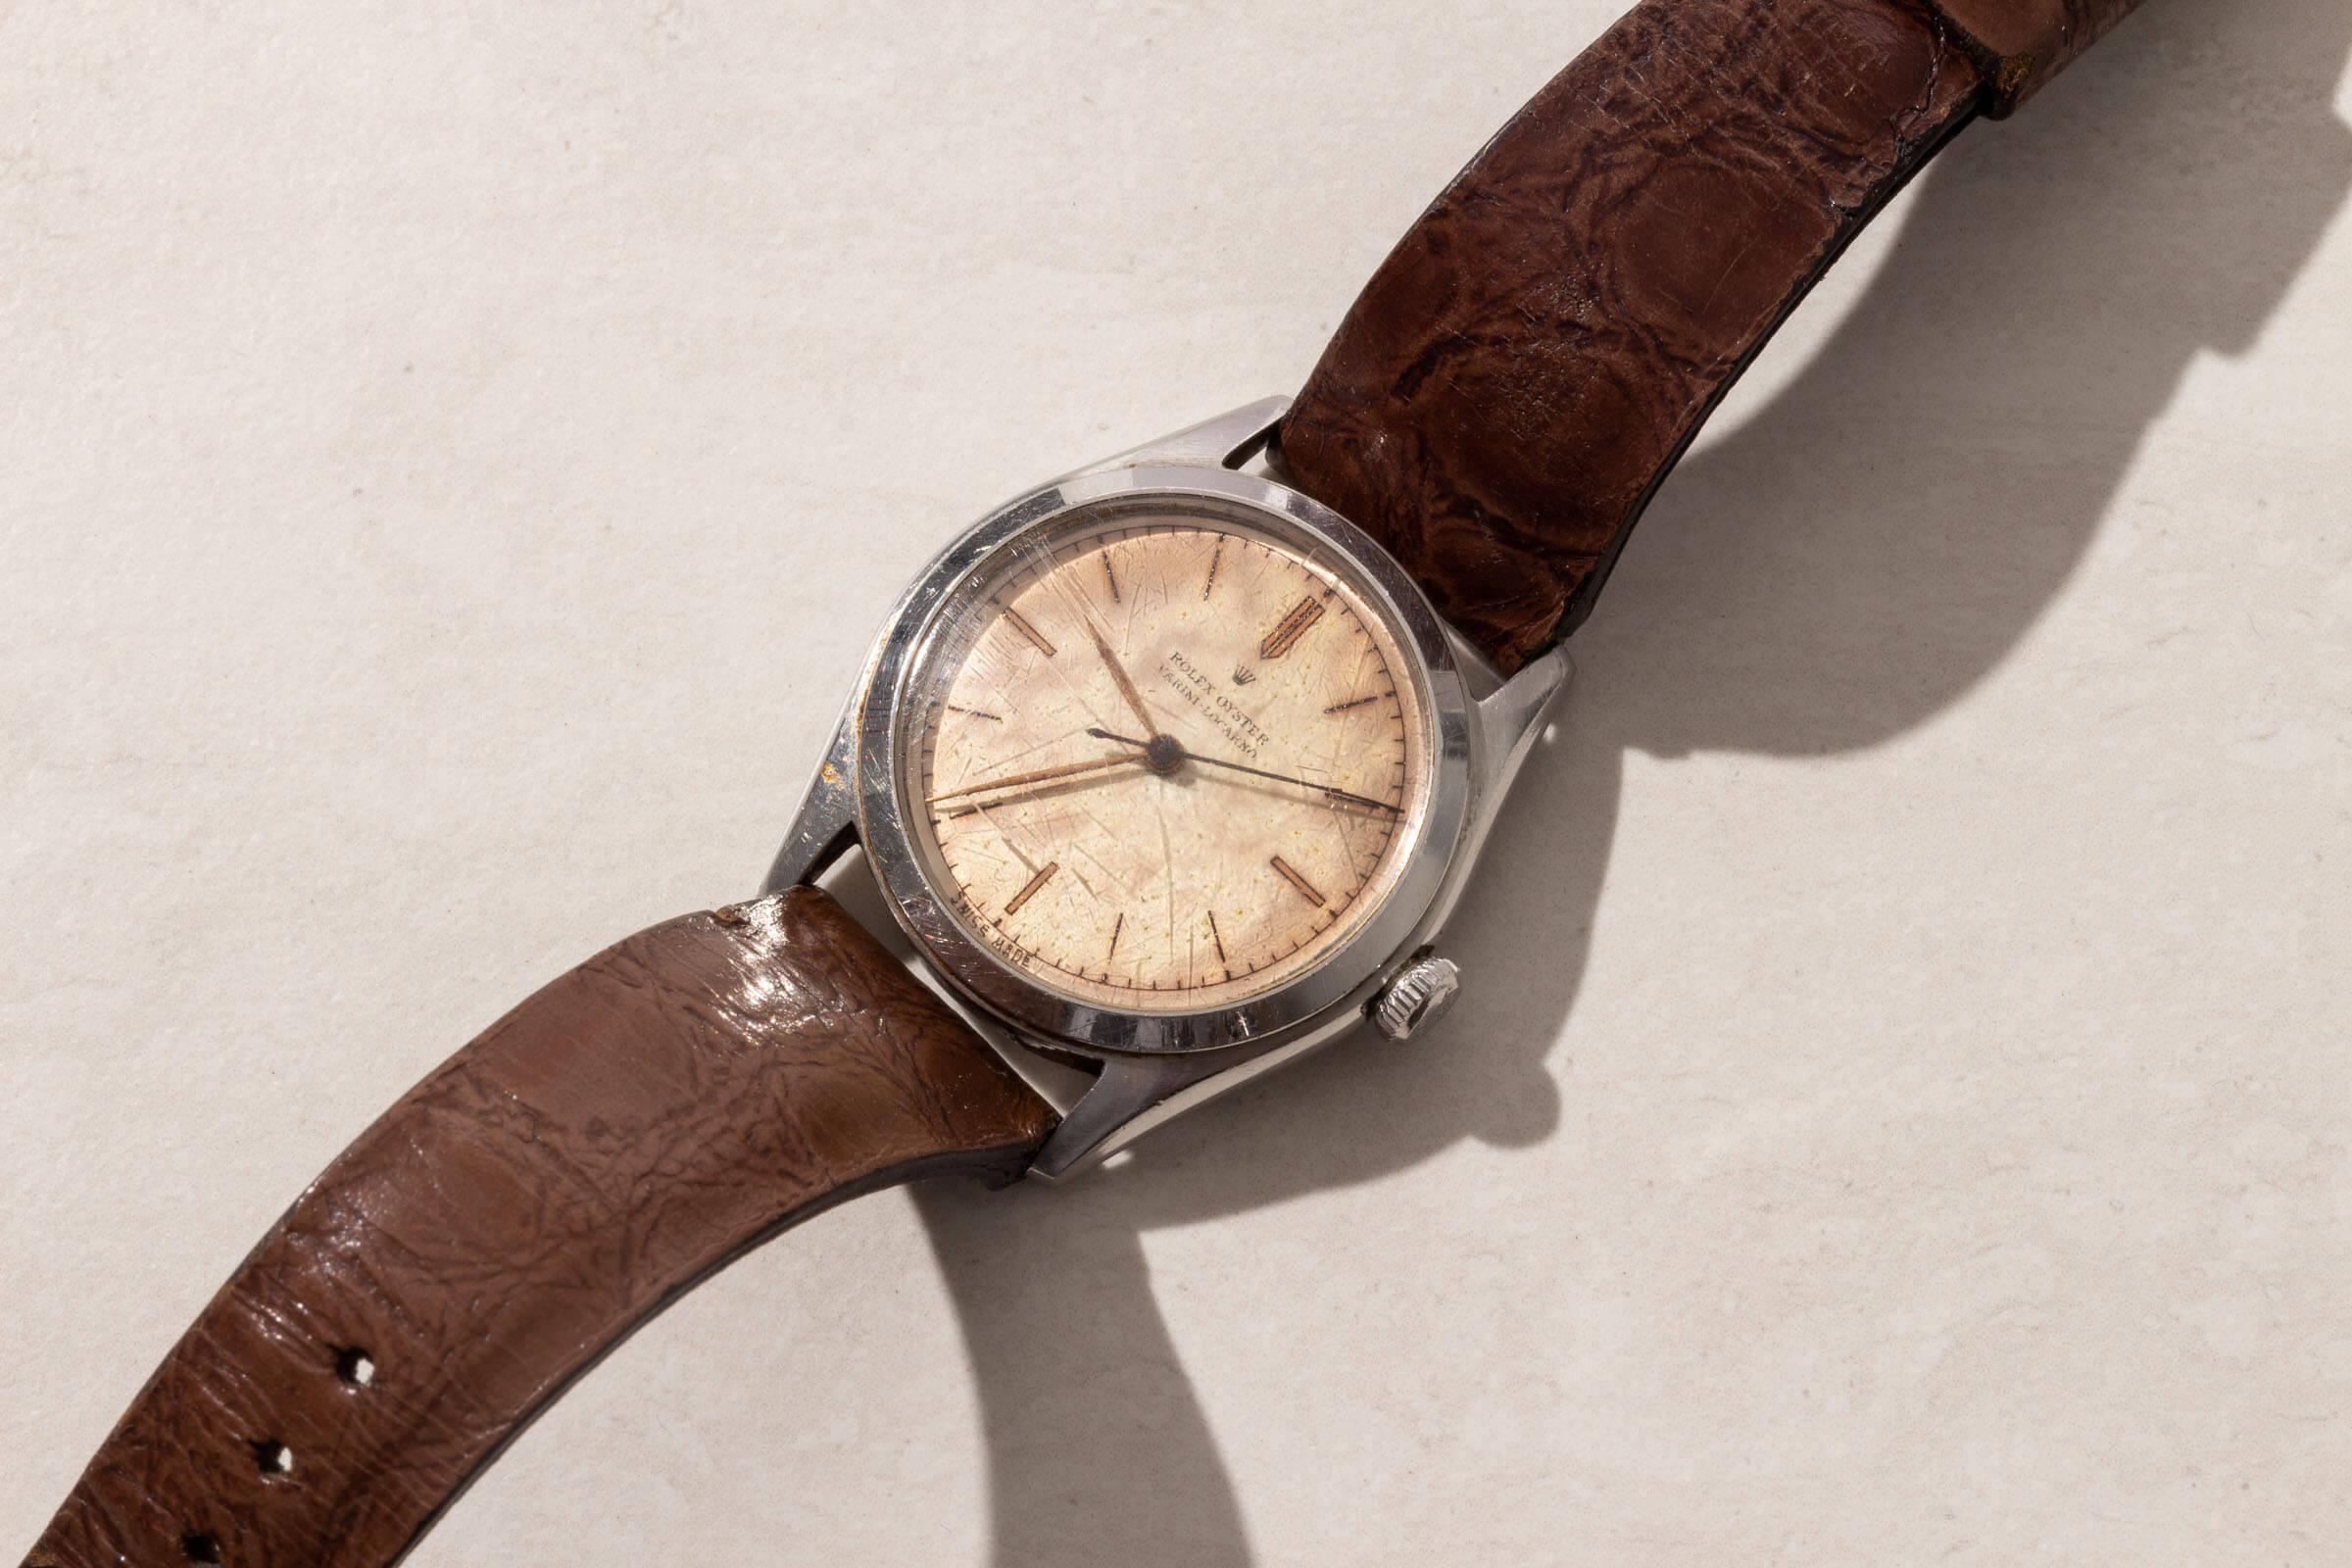 Rolex-Oyster-Varini-Locarno-Vintage